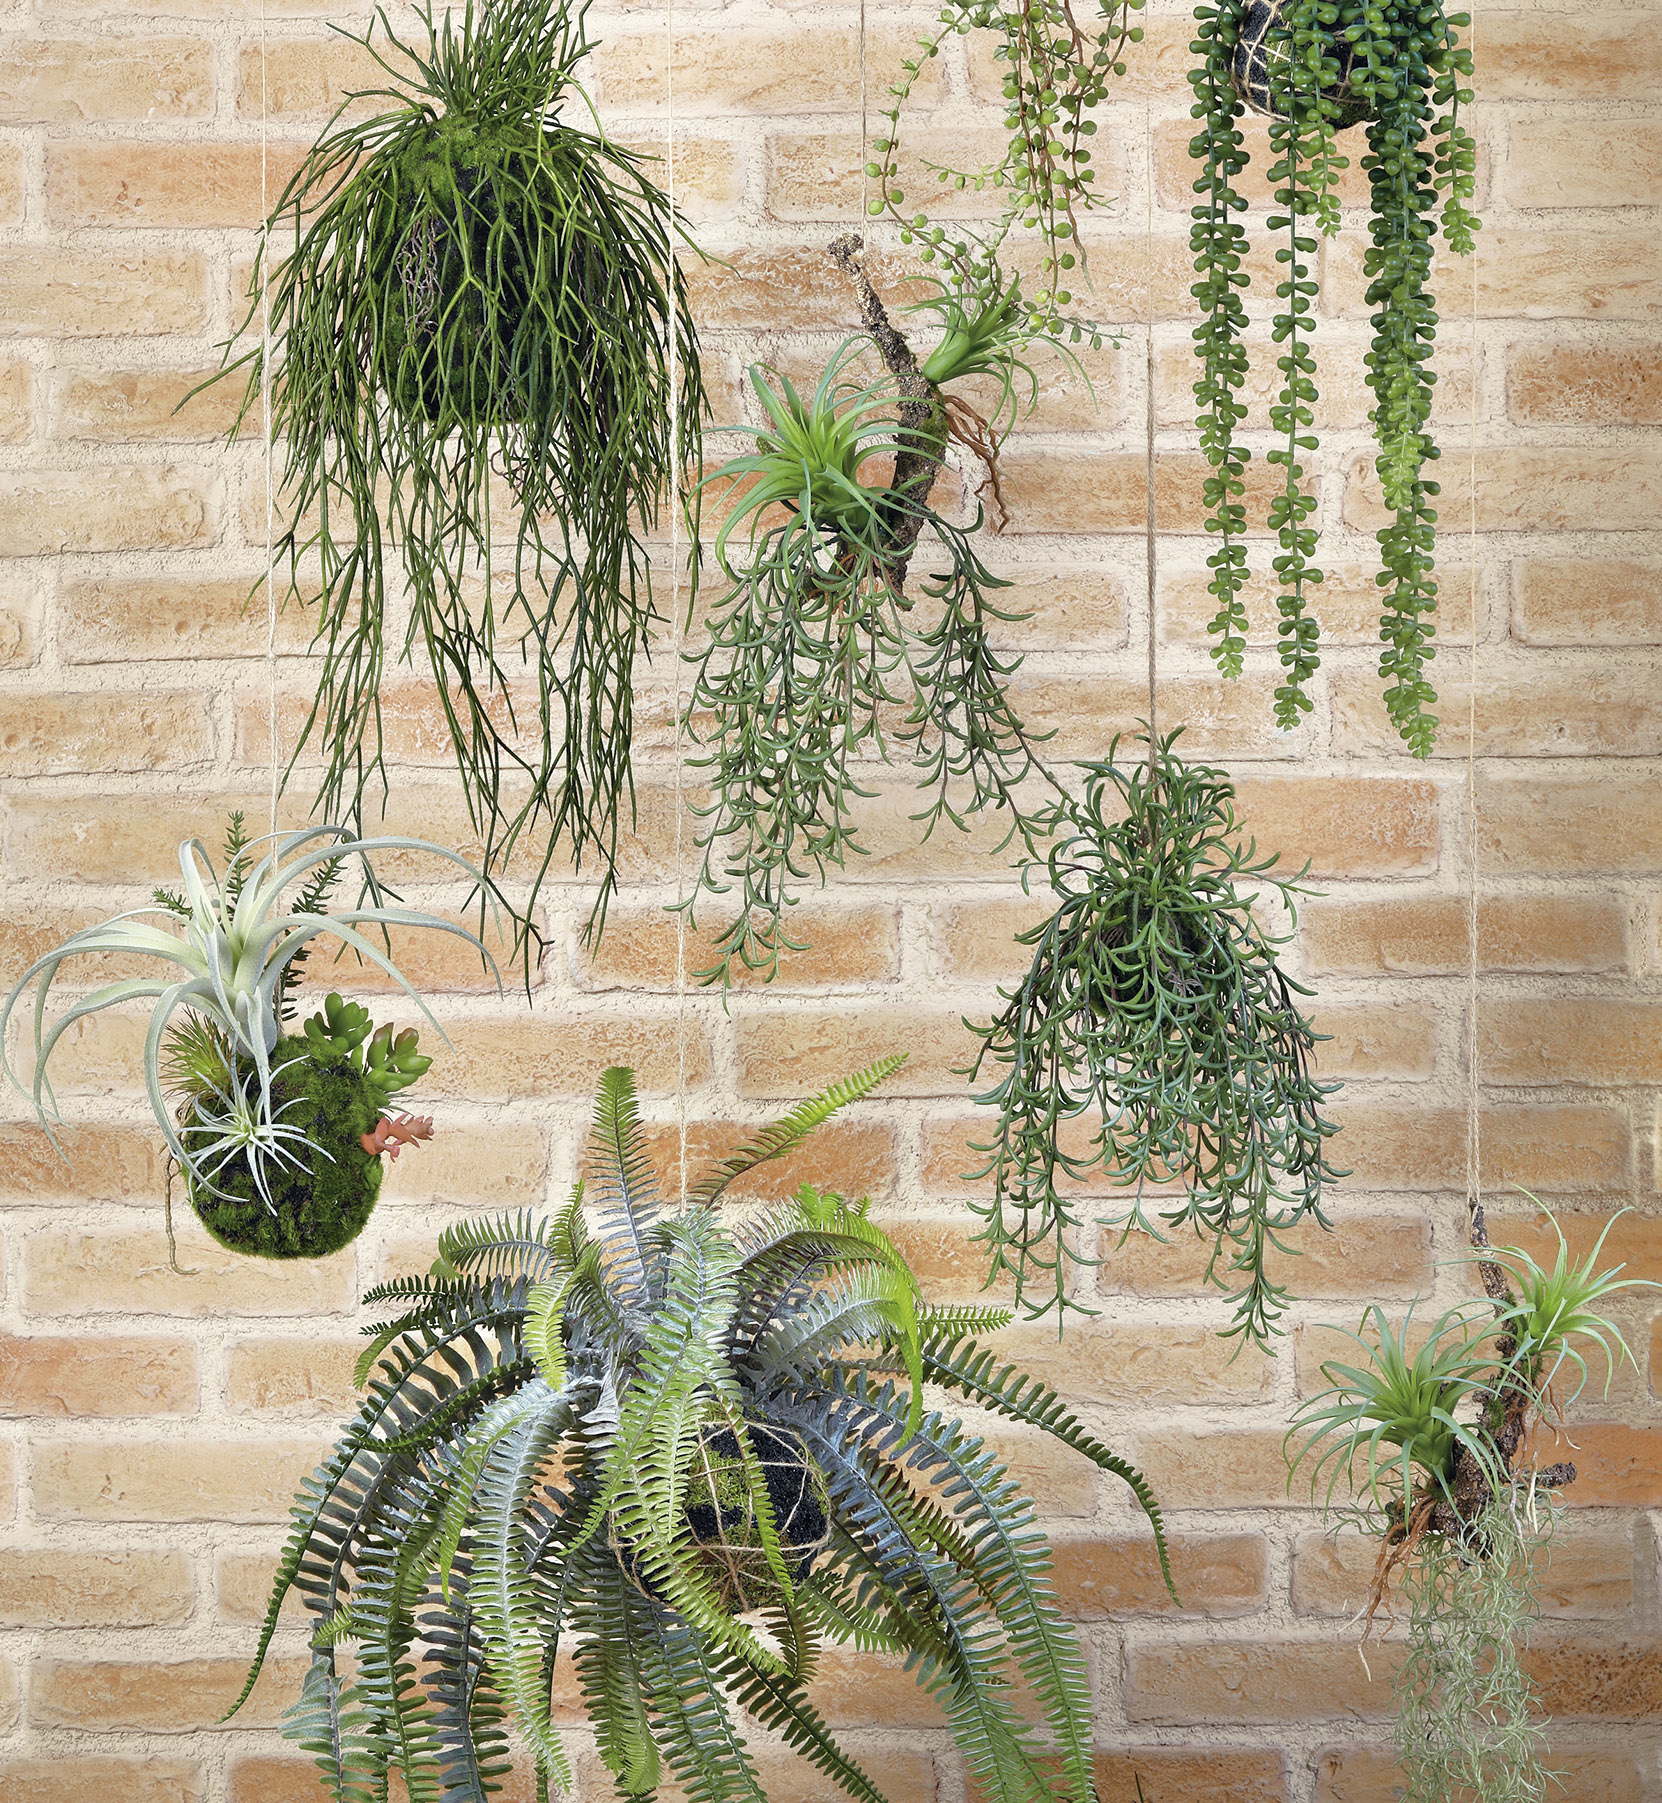 roots & greenery